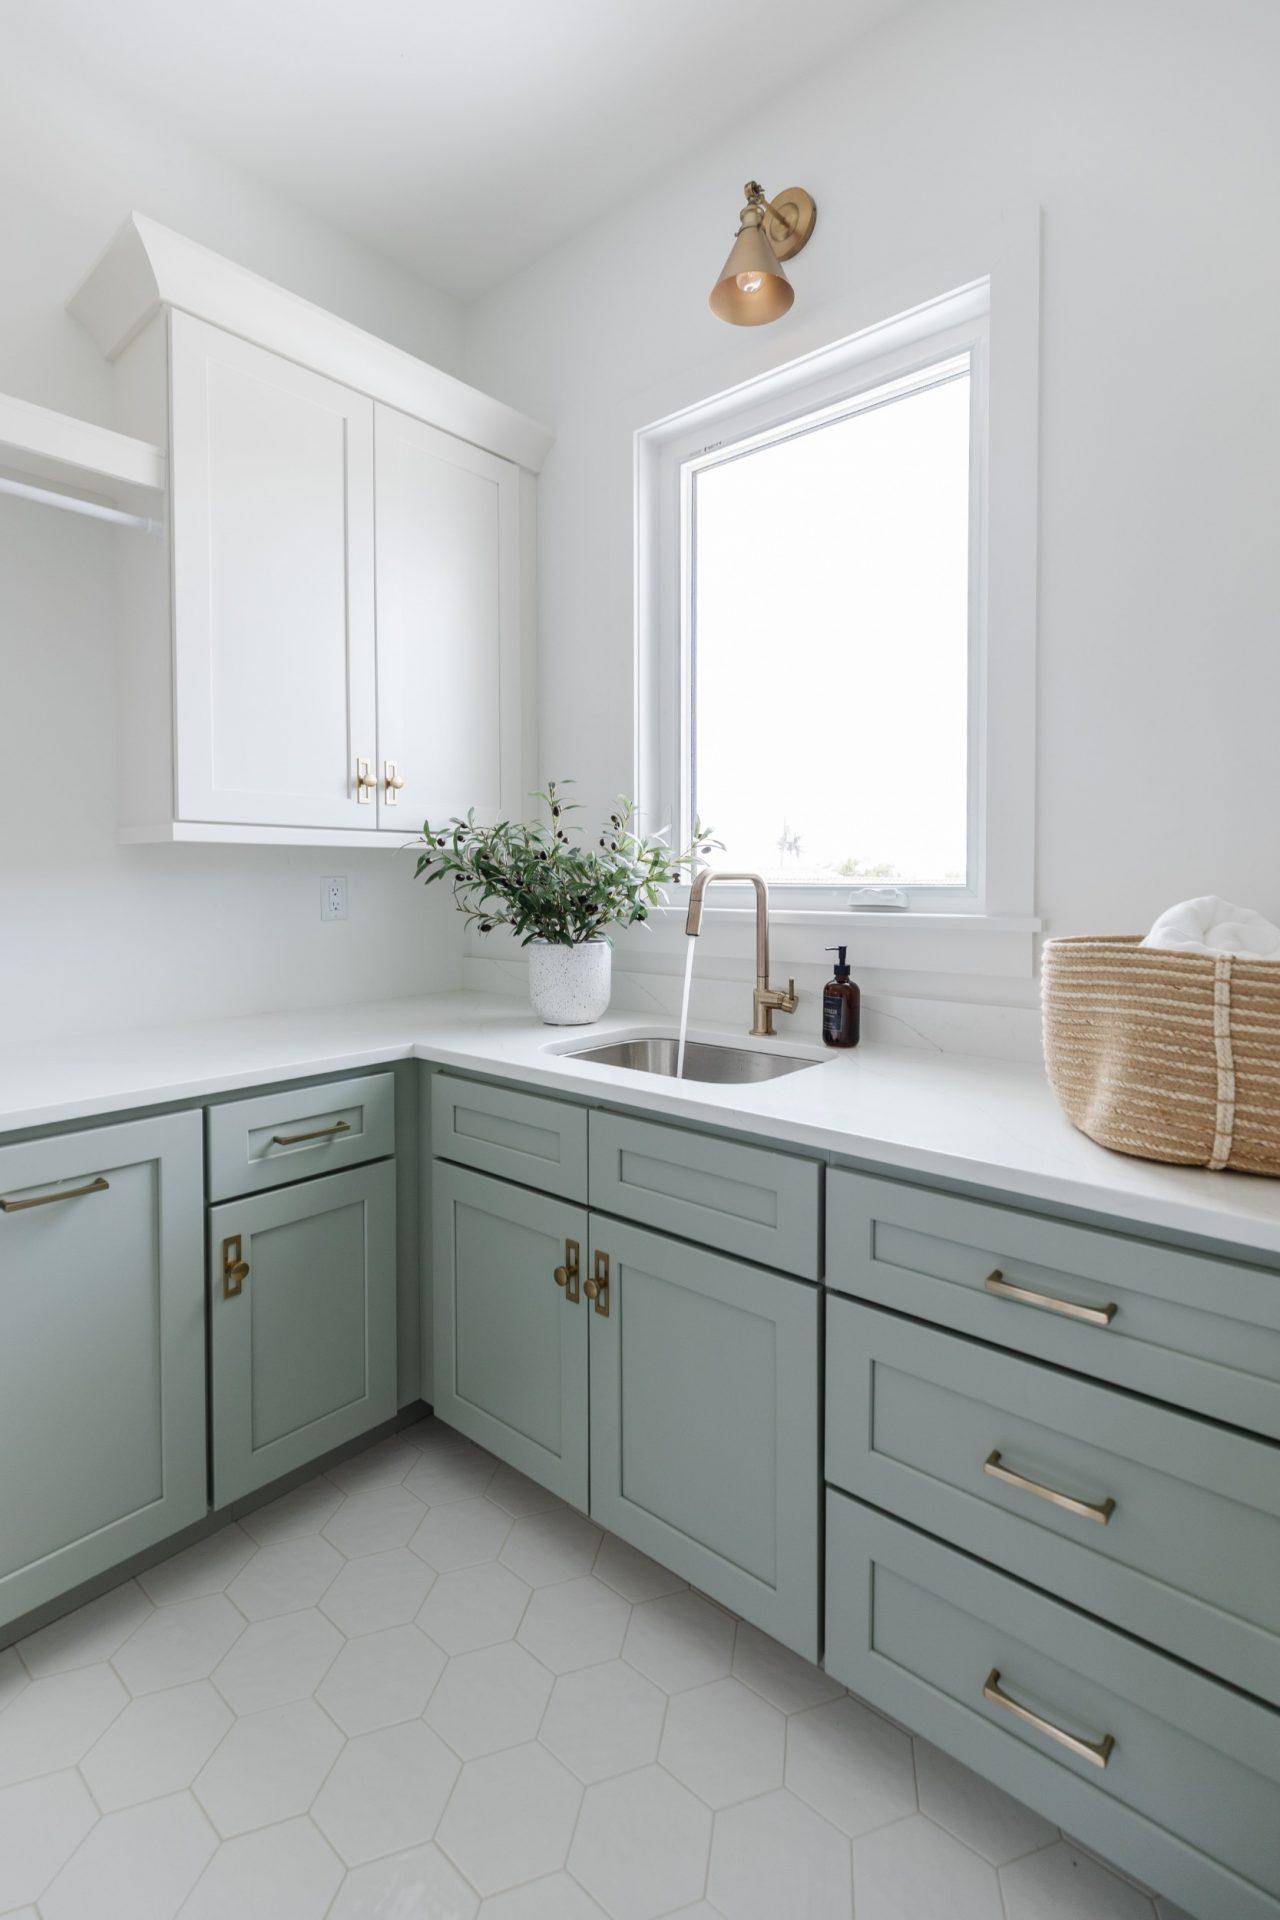 Peet's Perch | Laundry Room Sink